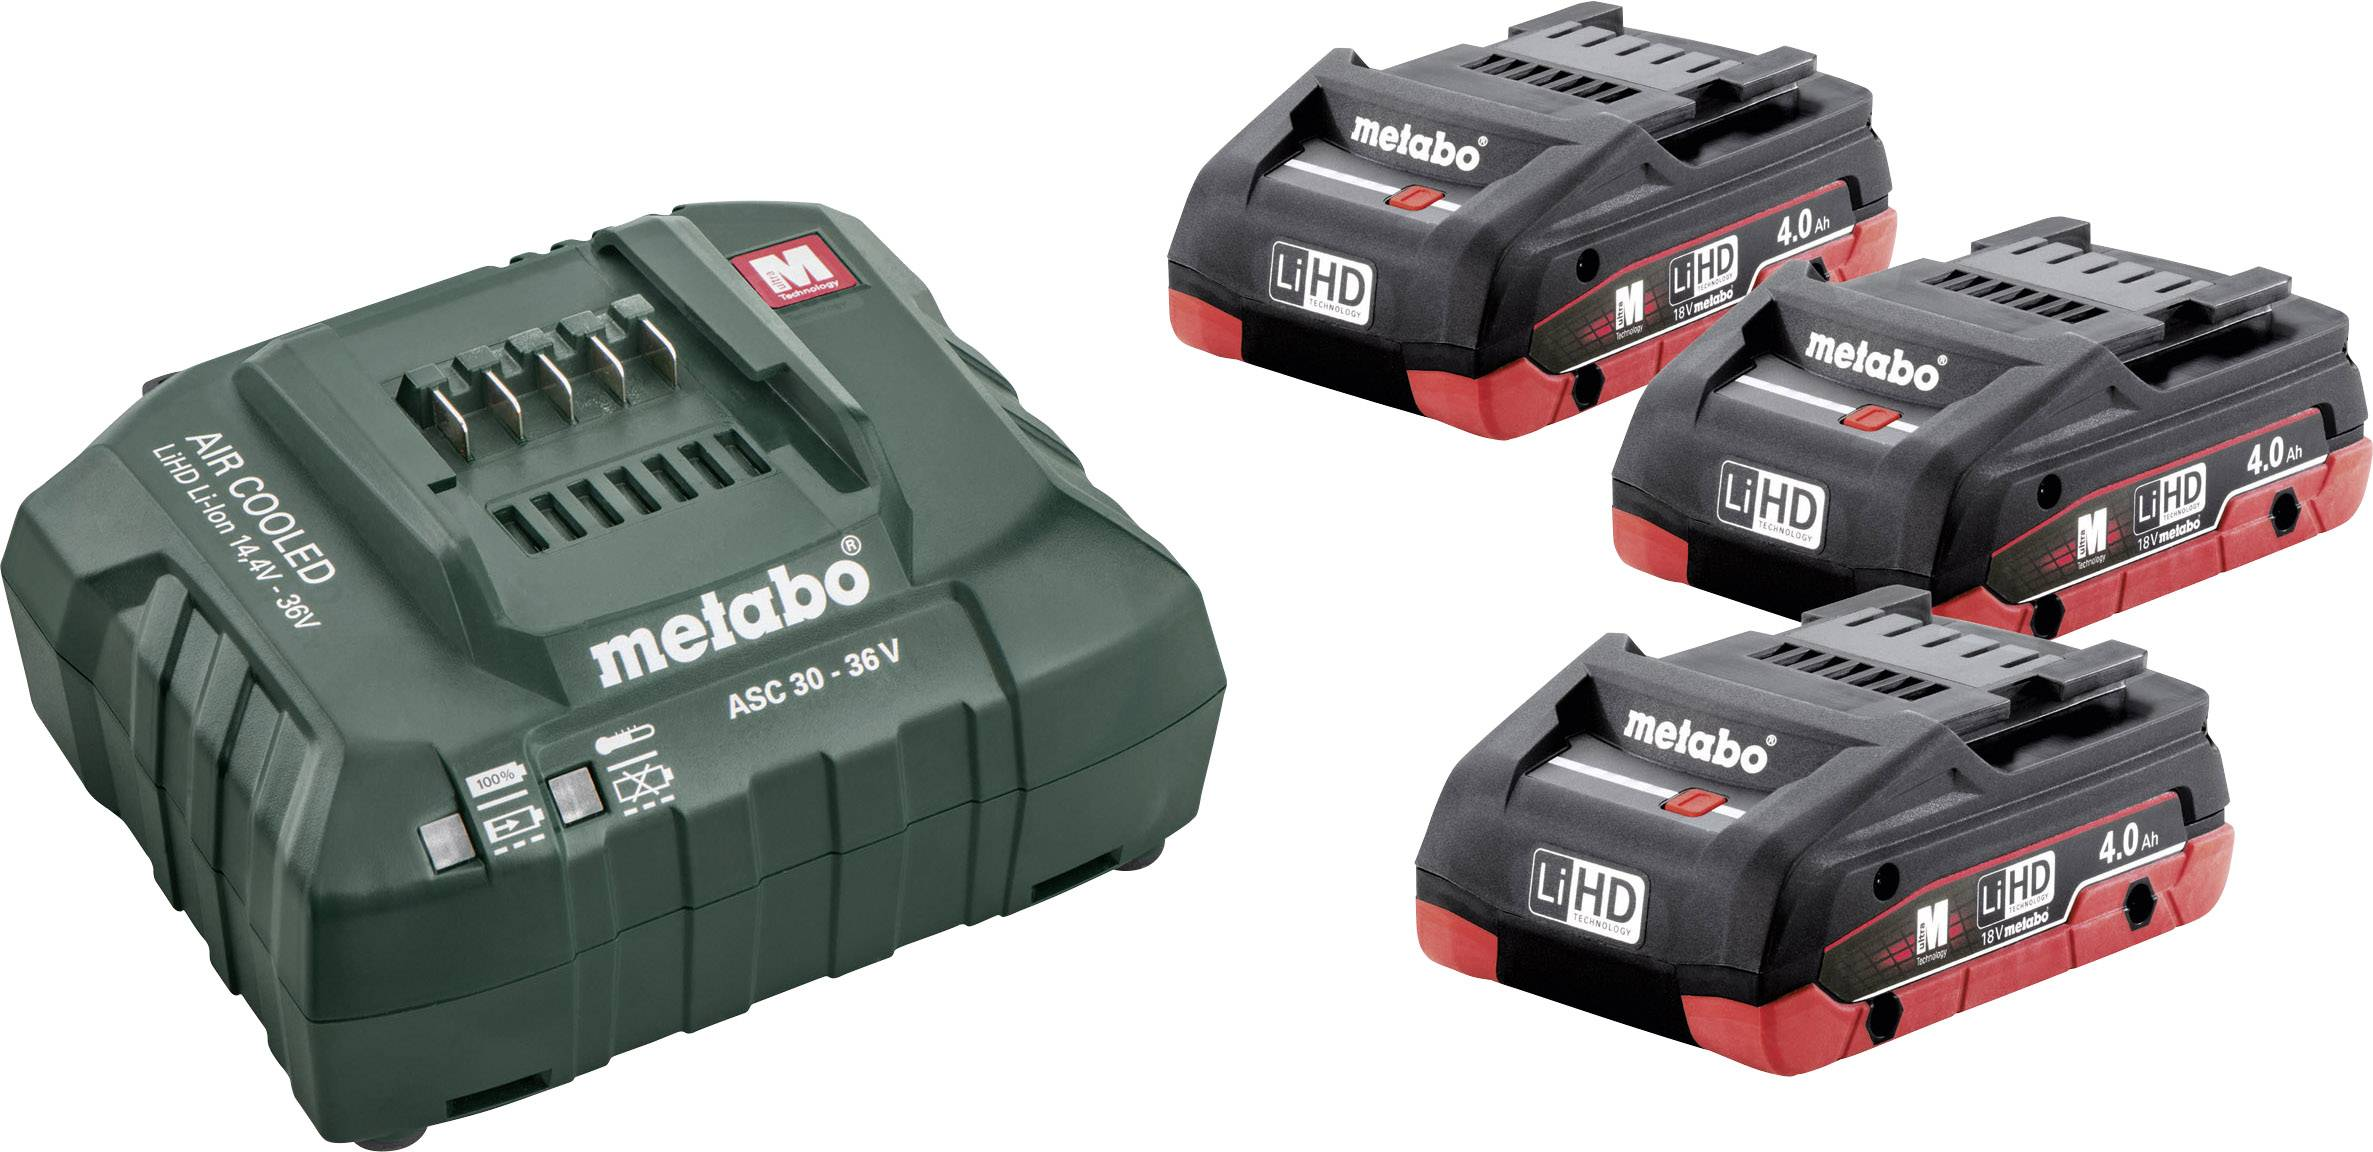 Náhradní akumulátor pro elektrické nářadí, Metabo 685132000, 18 V, 4.0 Ah, LiHD